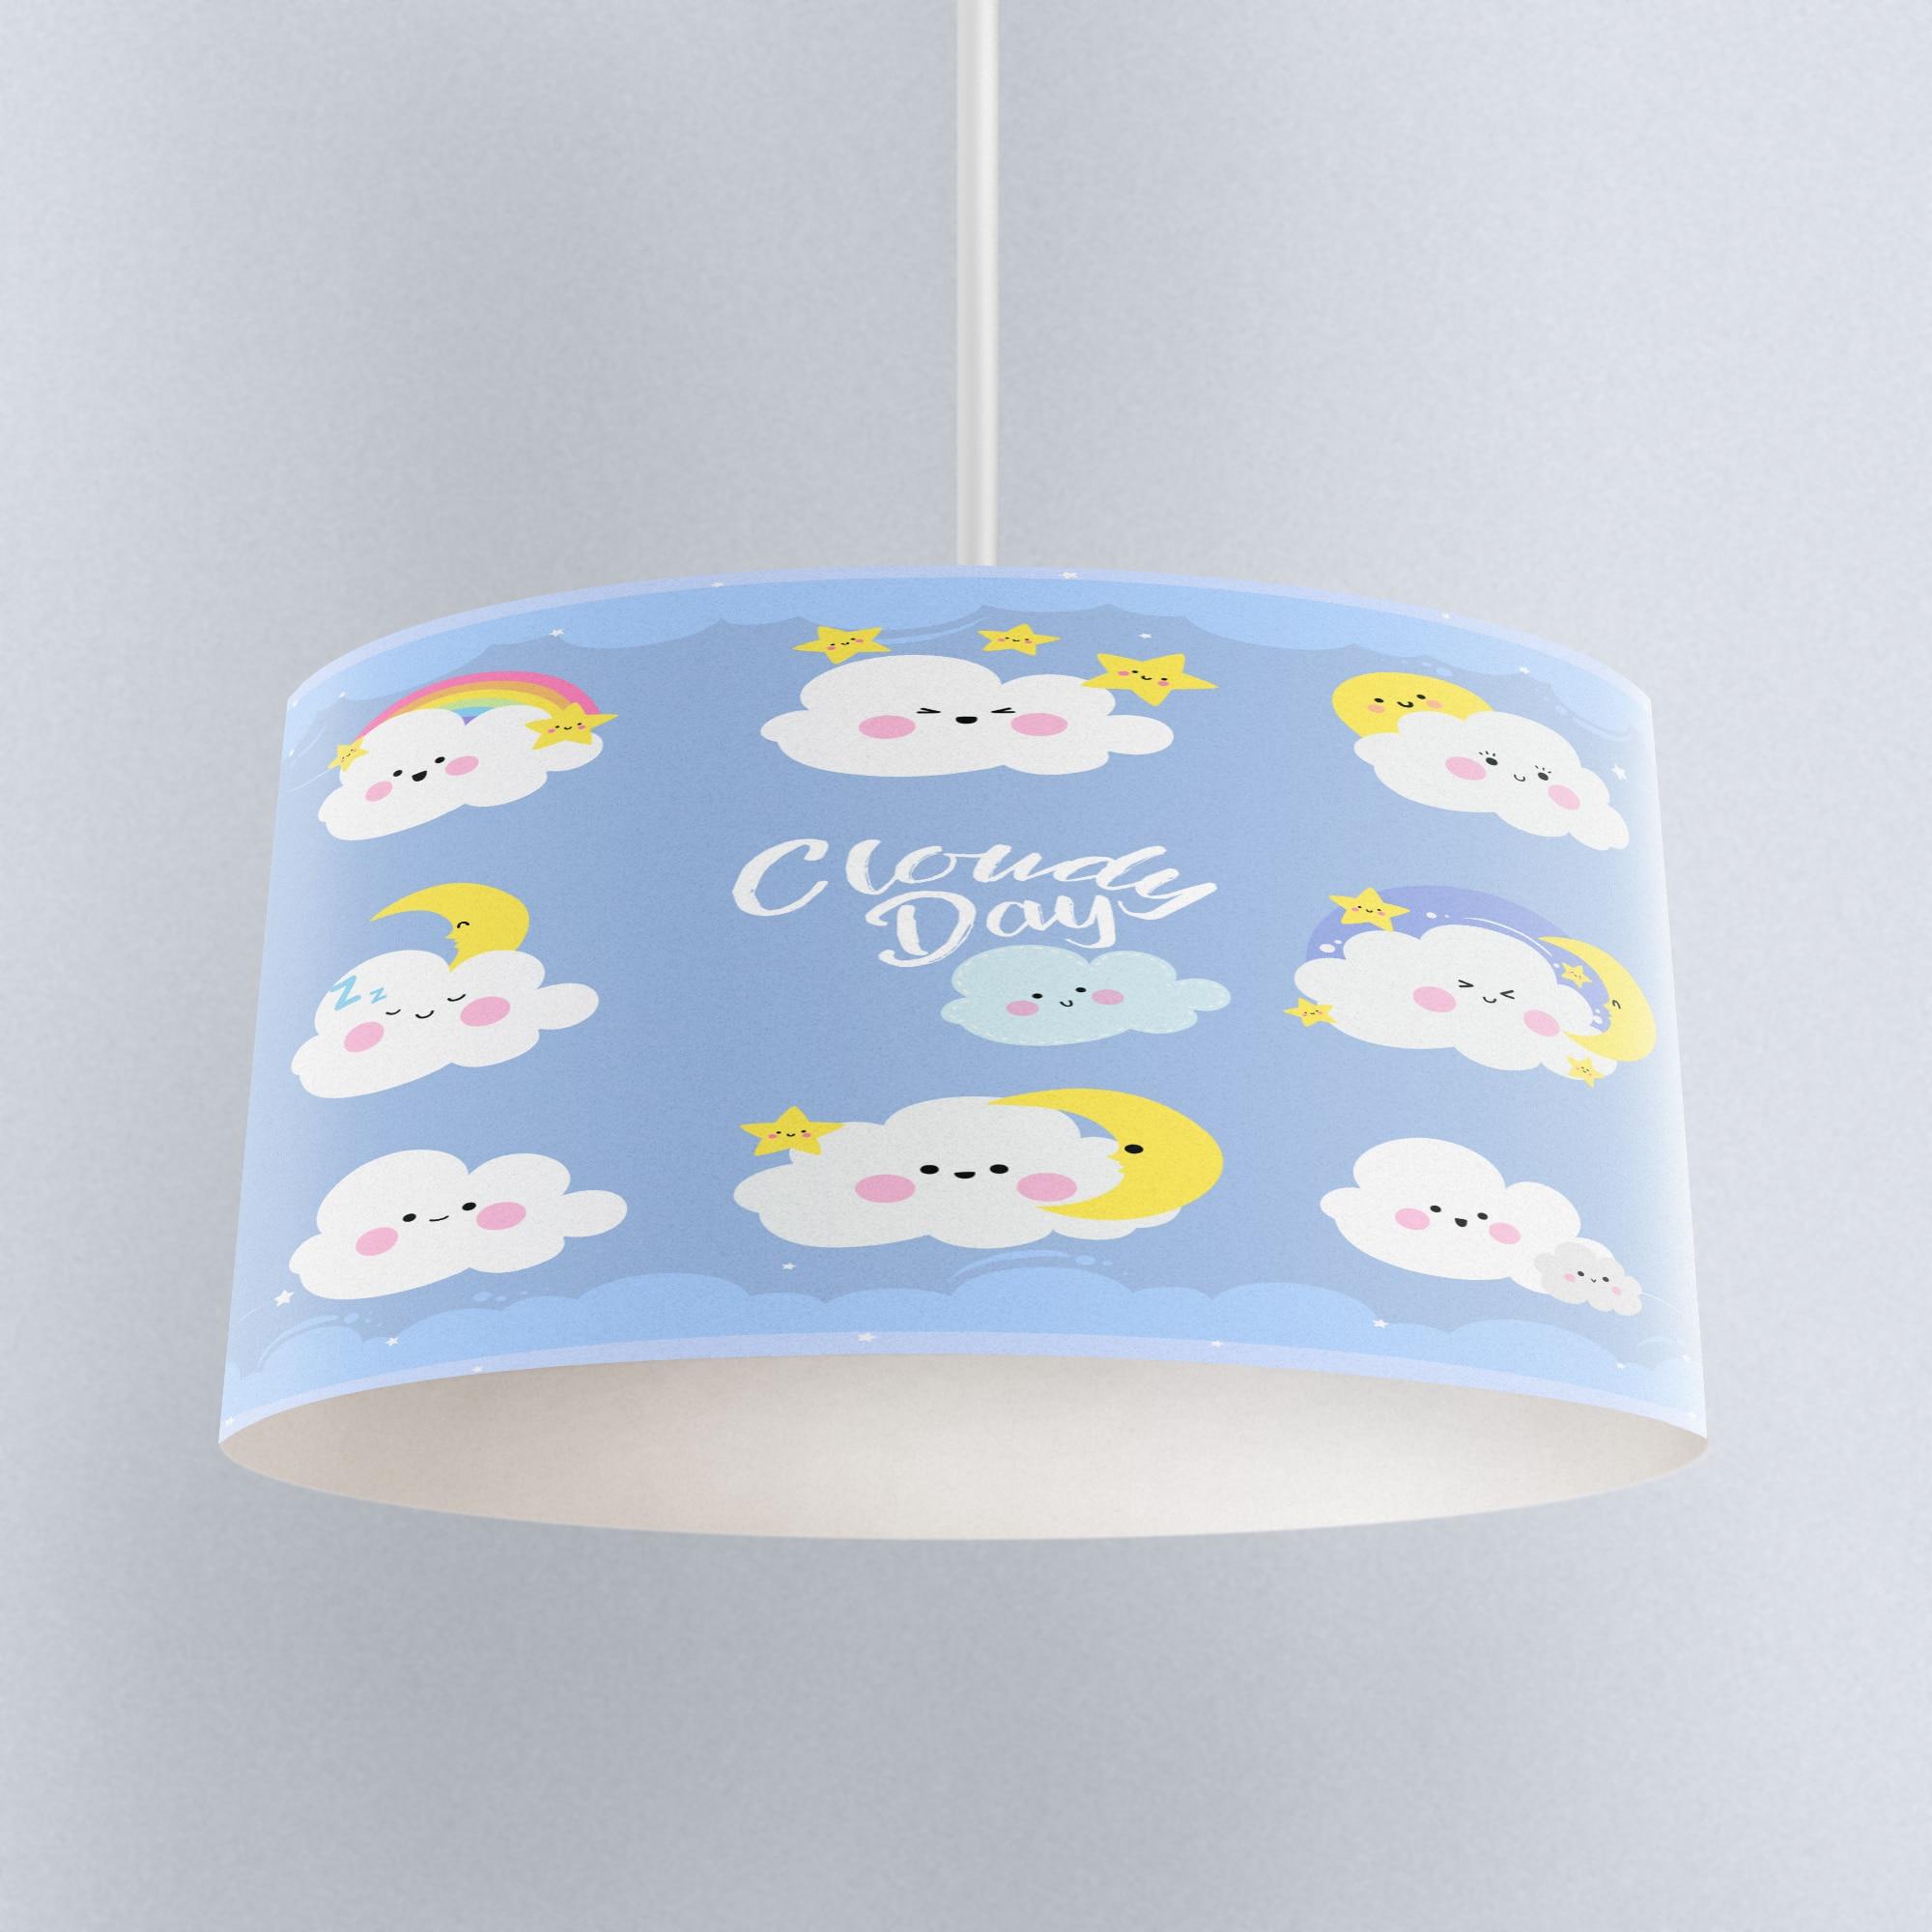 Else Blue Sky Funny Clouds Sleep Time Print Fabric Kids Chandelier Lamp Drum Lampshade Floor Ceiling Pendant Light Shade